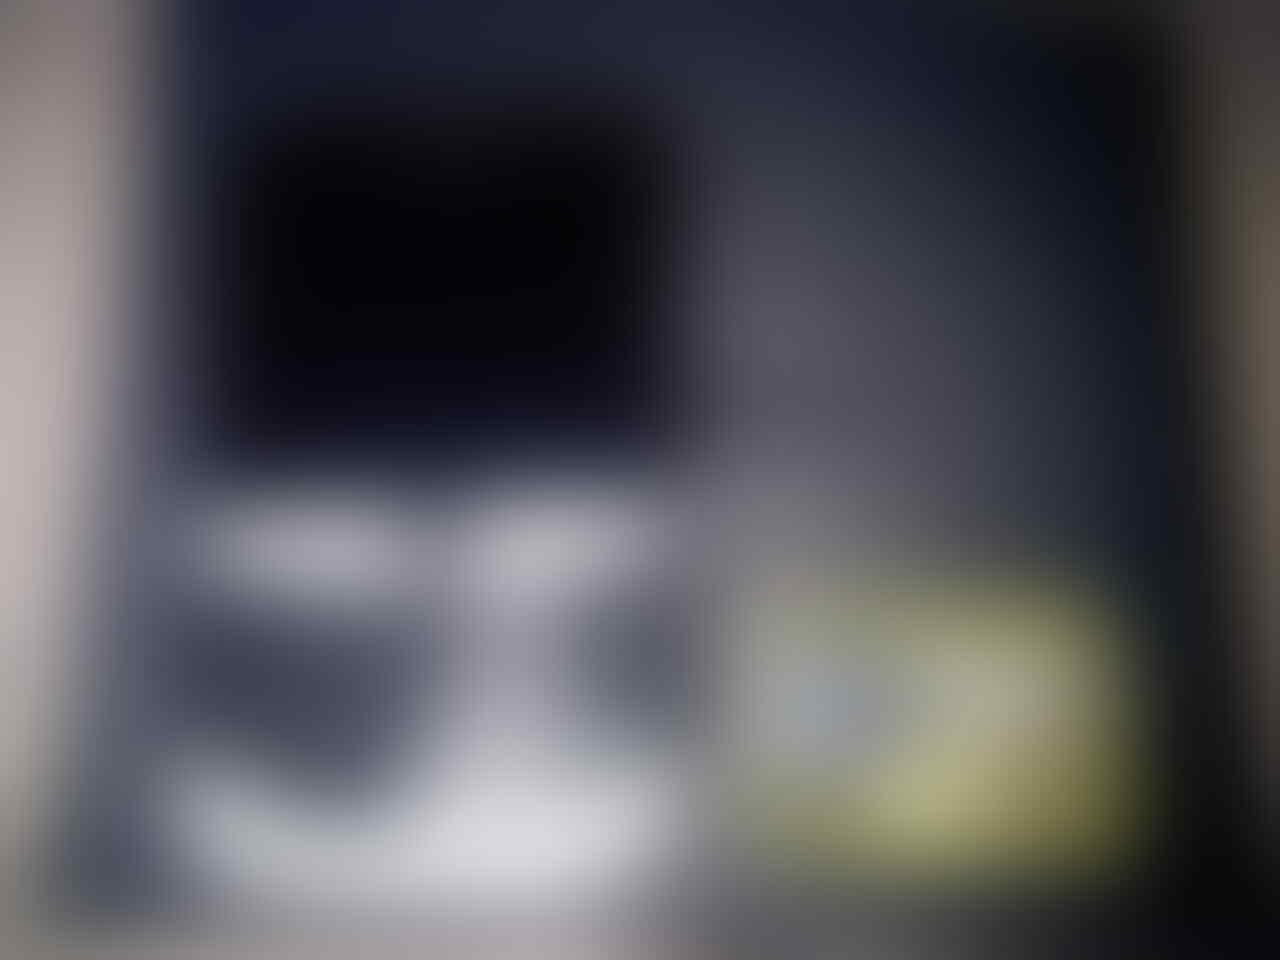 [WTS] Blackberry Dakota